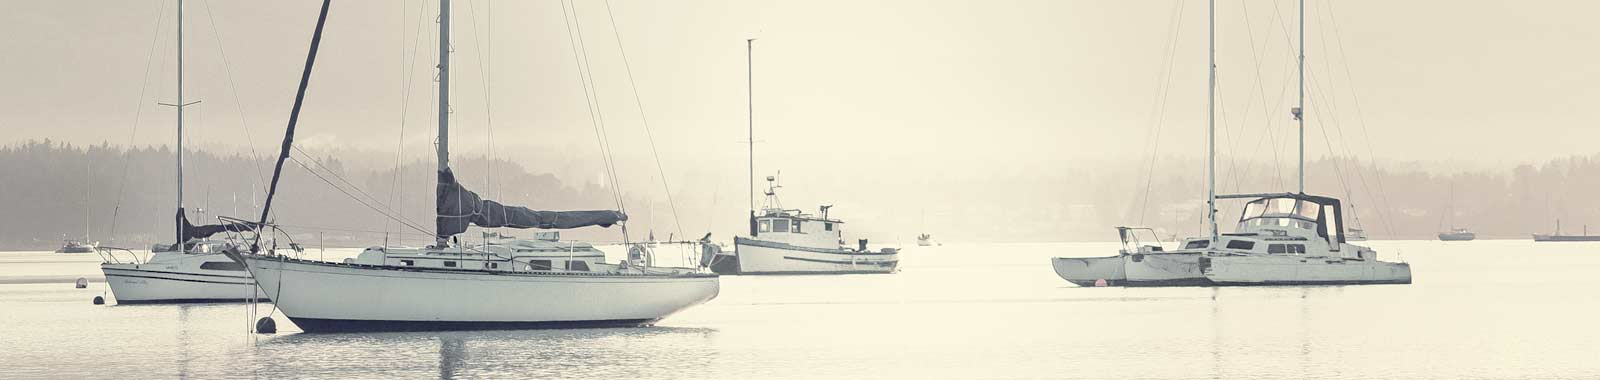 Sailing co-op